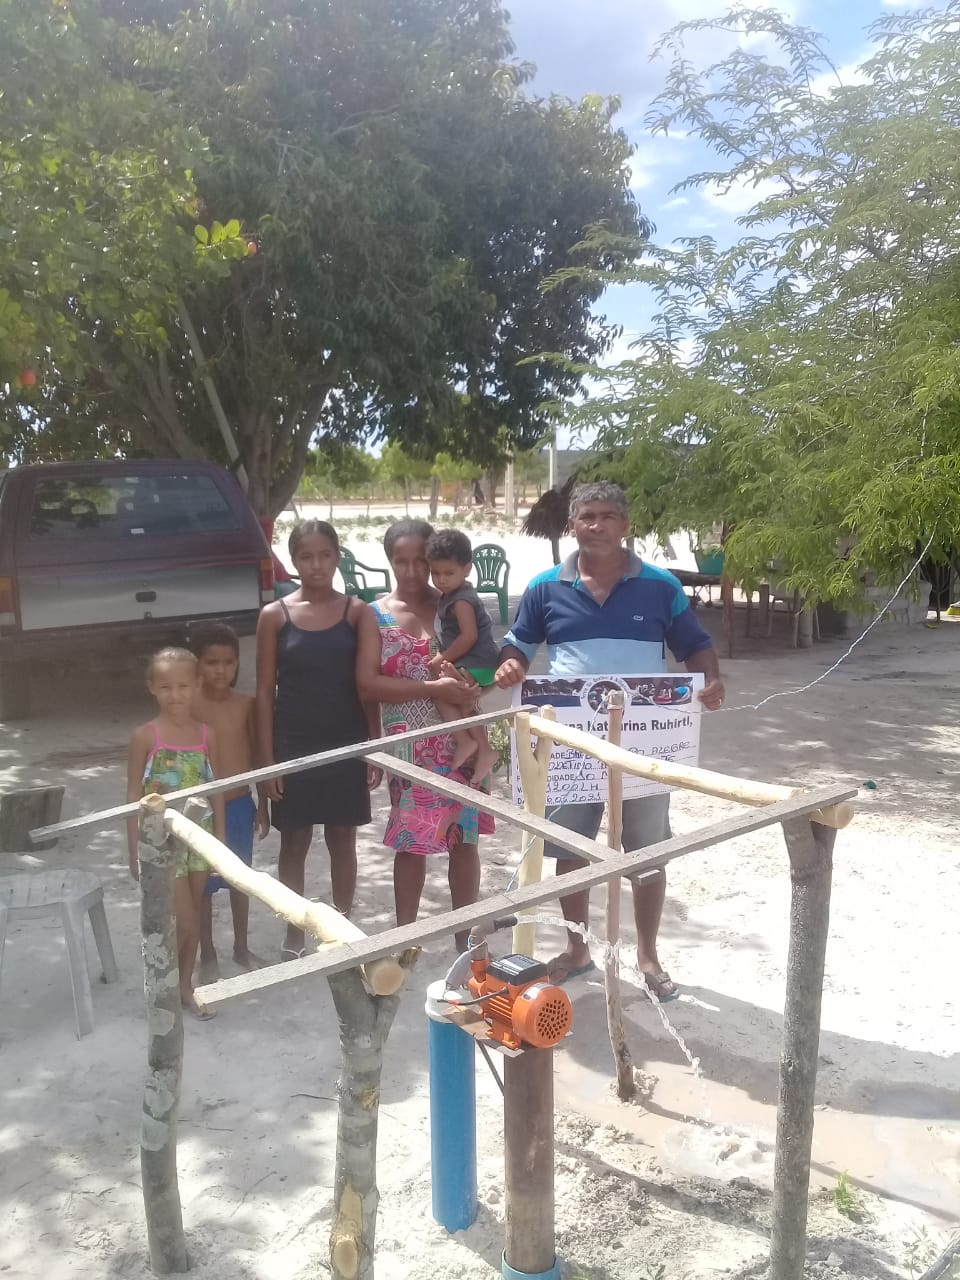 2021-03-16 Bahia - Image 2